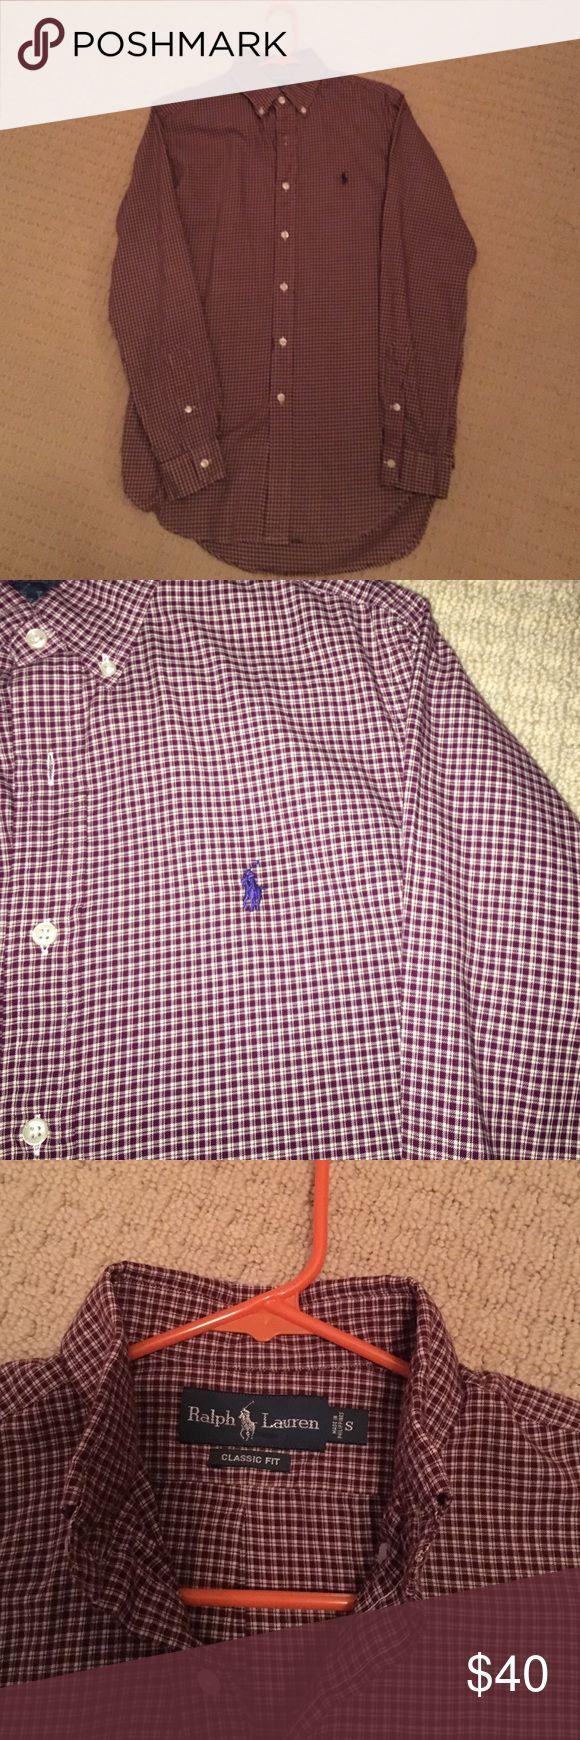 Men's Polo Ralph Lauren dress shirt Size S, dark red mini-plaid.  Great condition! Polo by Ralph Lauren Shirts Dress Shirts